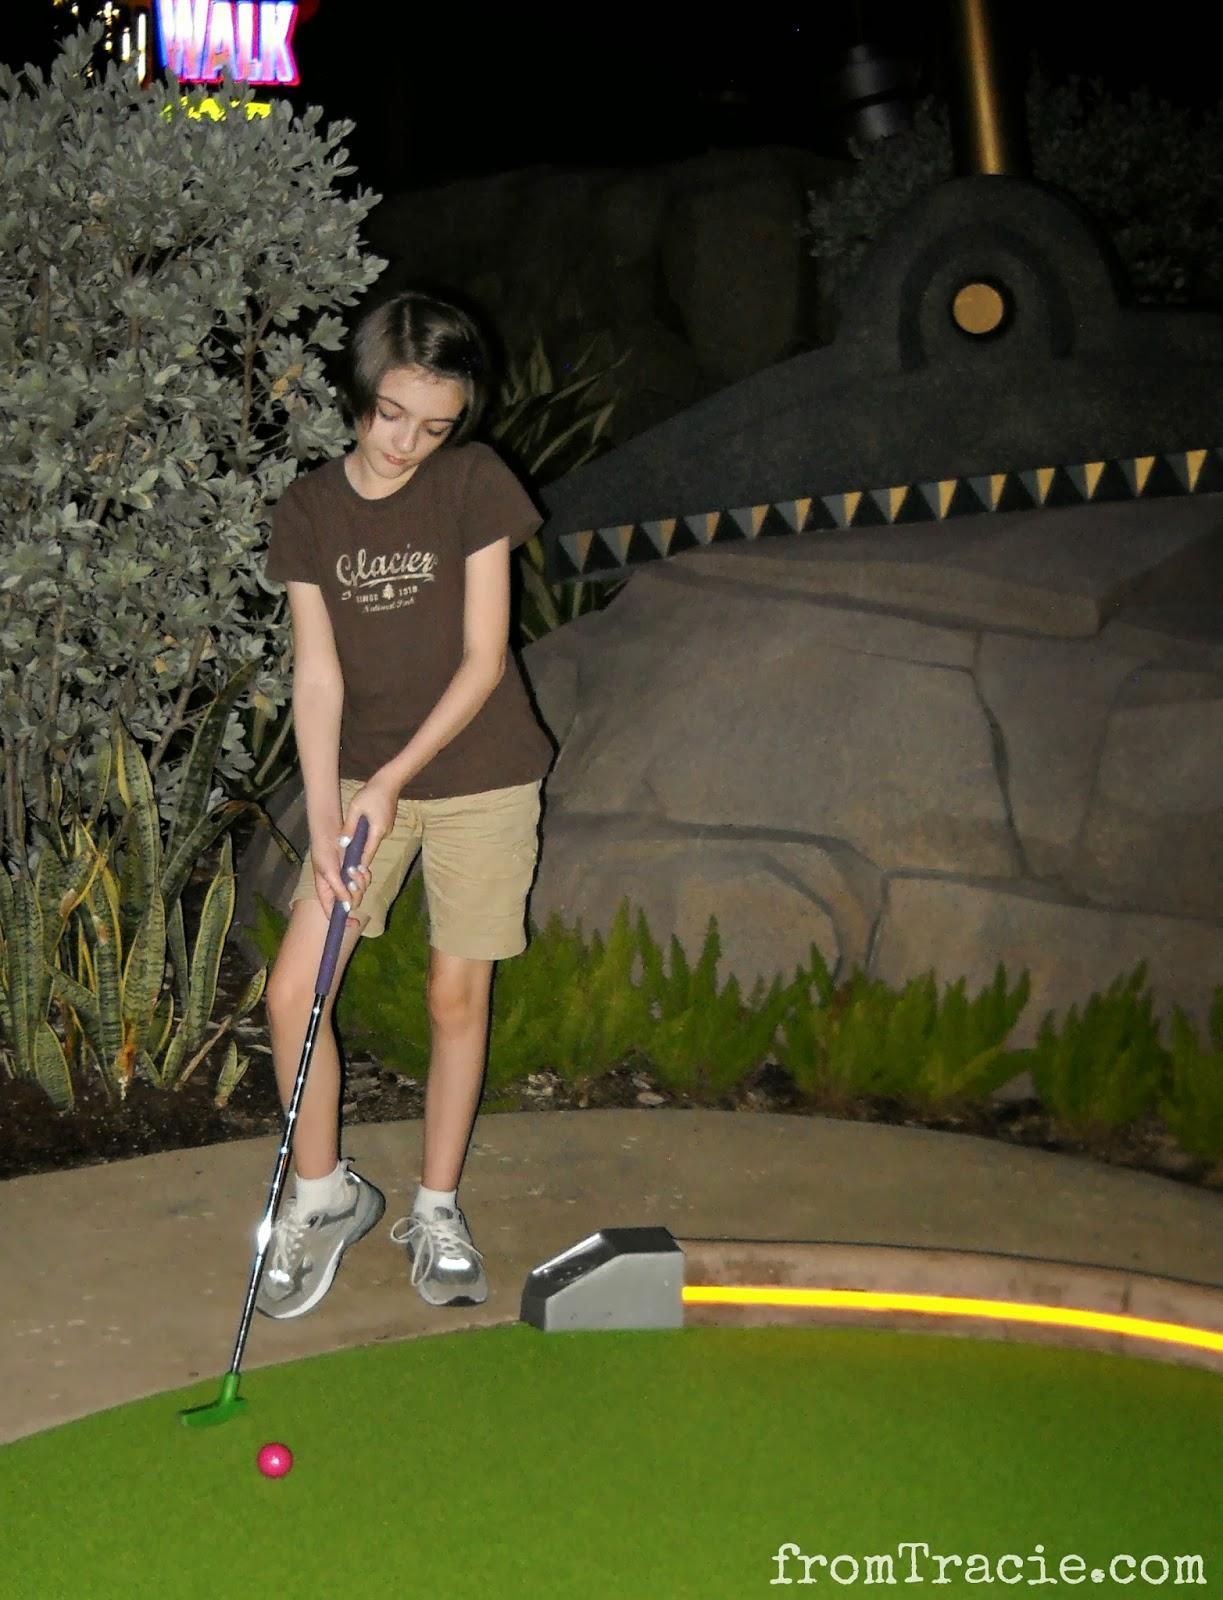 Katarina Mini-Golfing